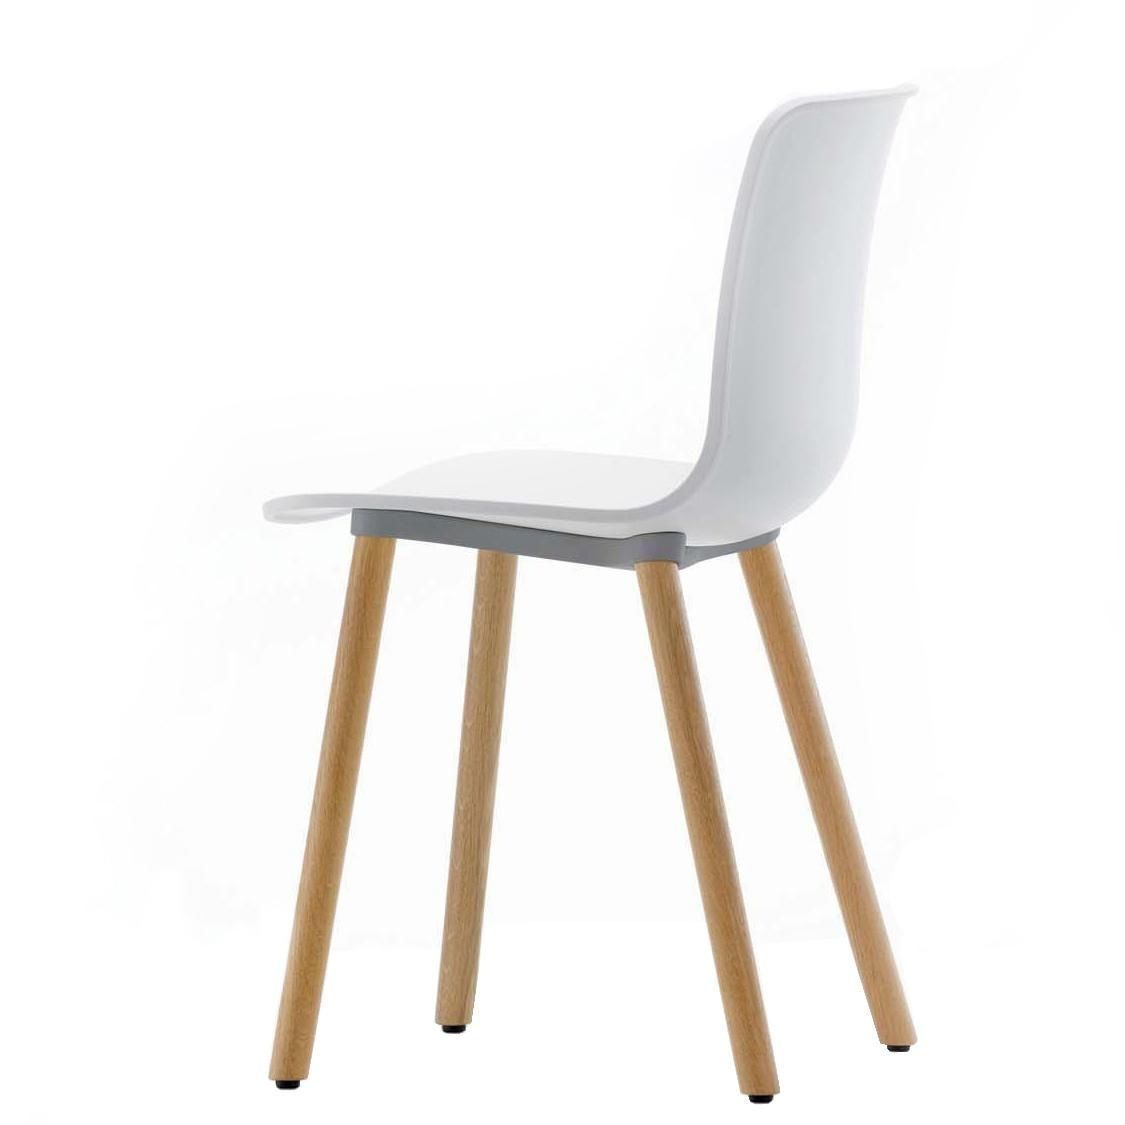 Hal wood chair vitra - Designer stuhl vitra ...